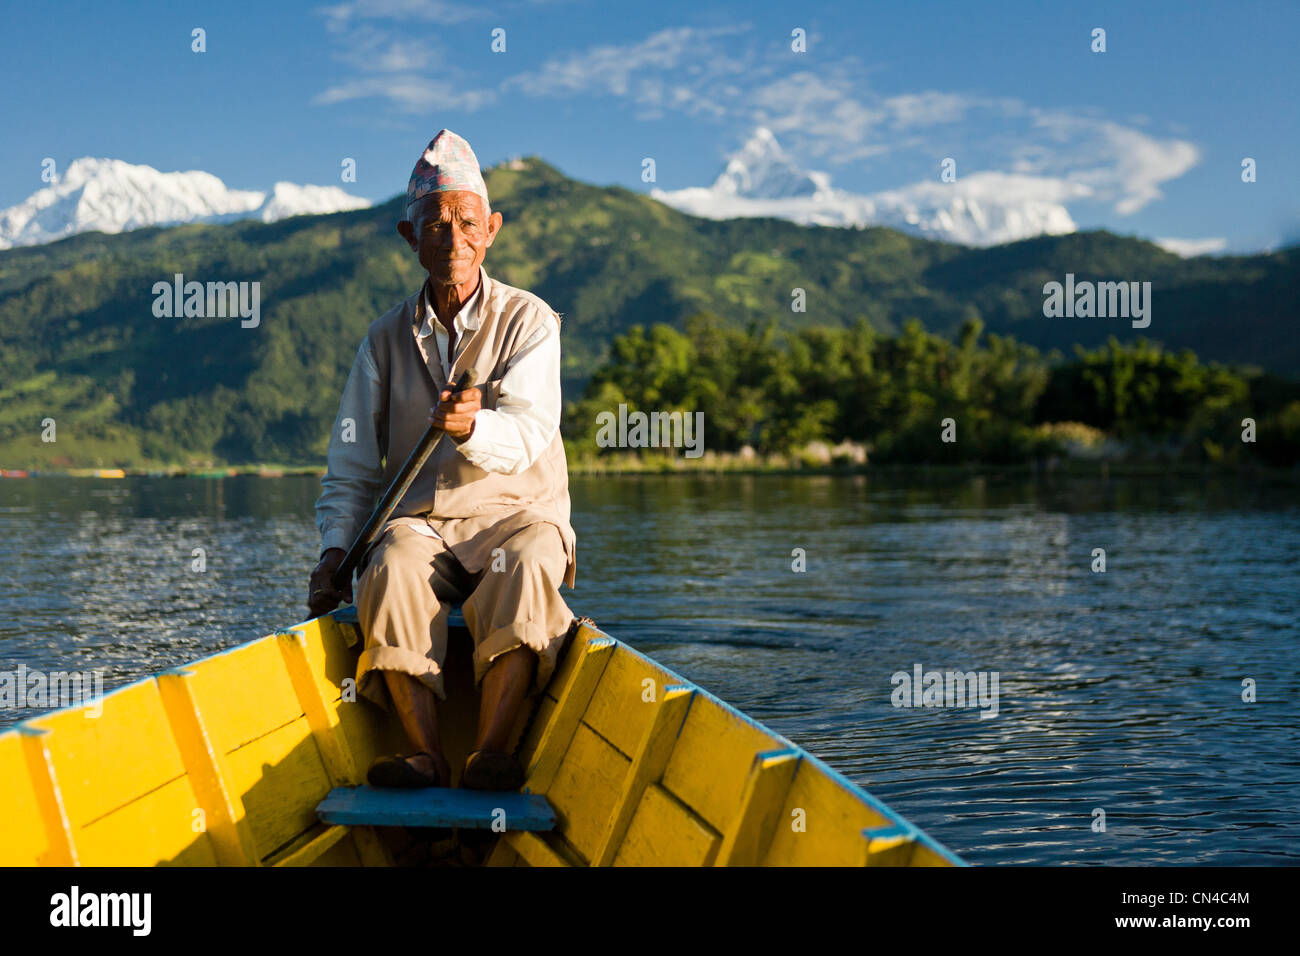 Hombre nepalés barco tradicional de remo Imagen De Stock